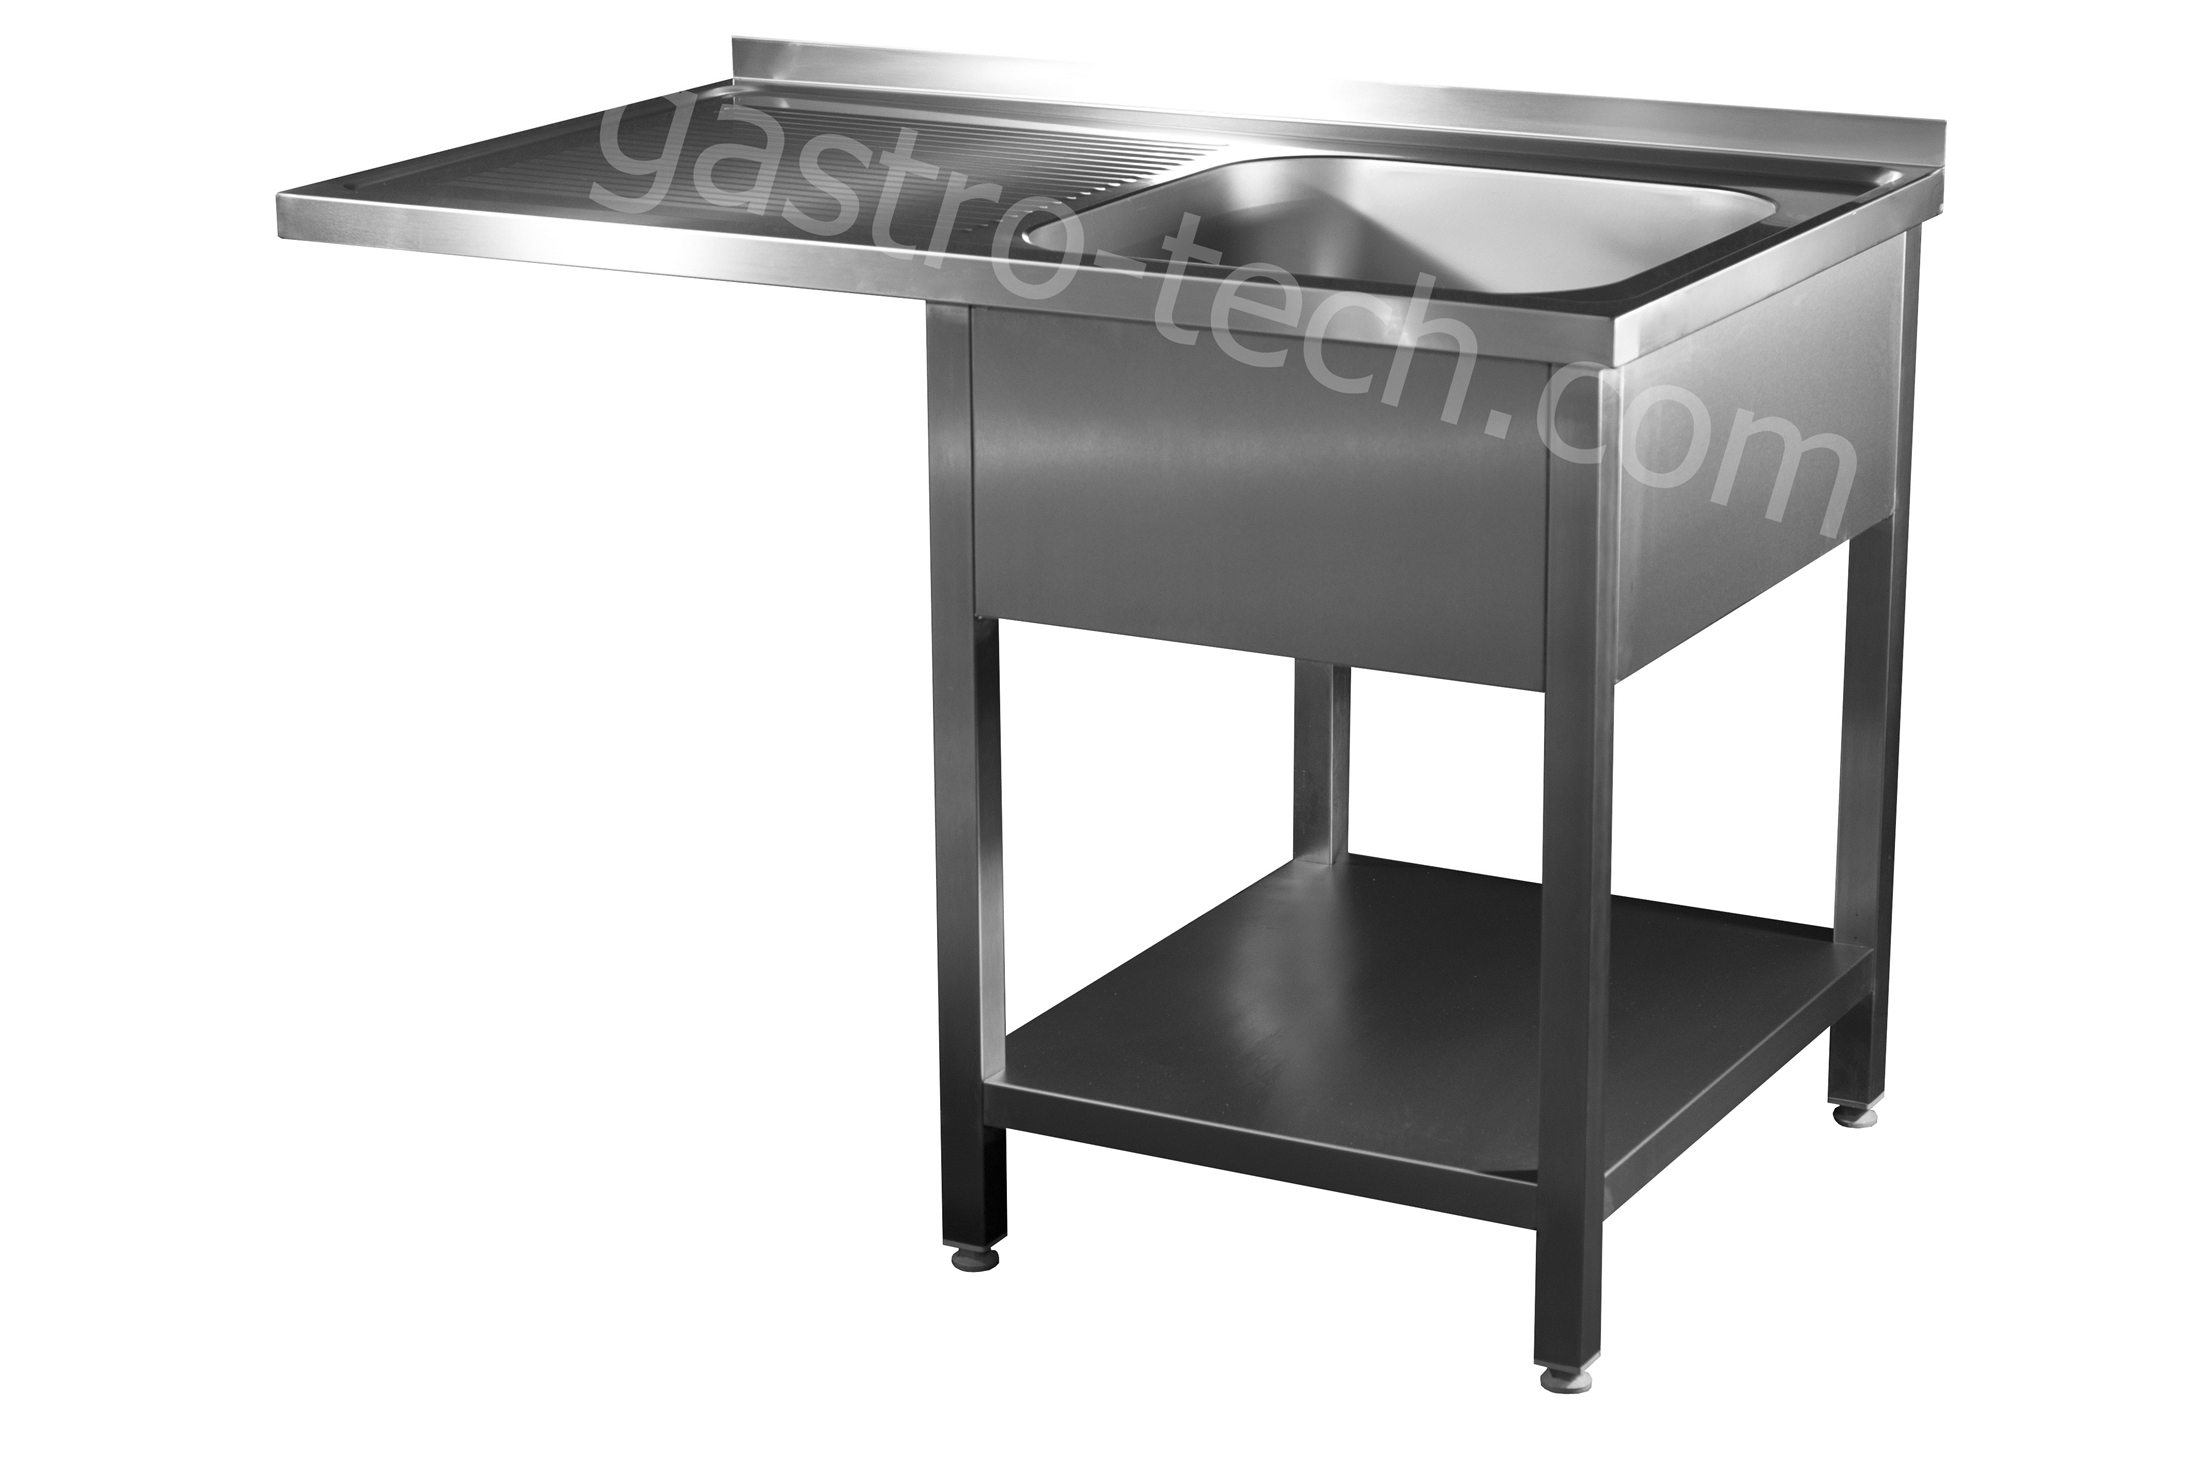 edelstahl sp lcenter b 120 t 60 h 85 1 be re verschwei t sp ltisch sp lmaschine ebay. Black Bedroom Furniture Sets. Home Design Ideas